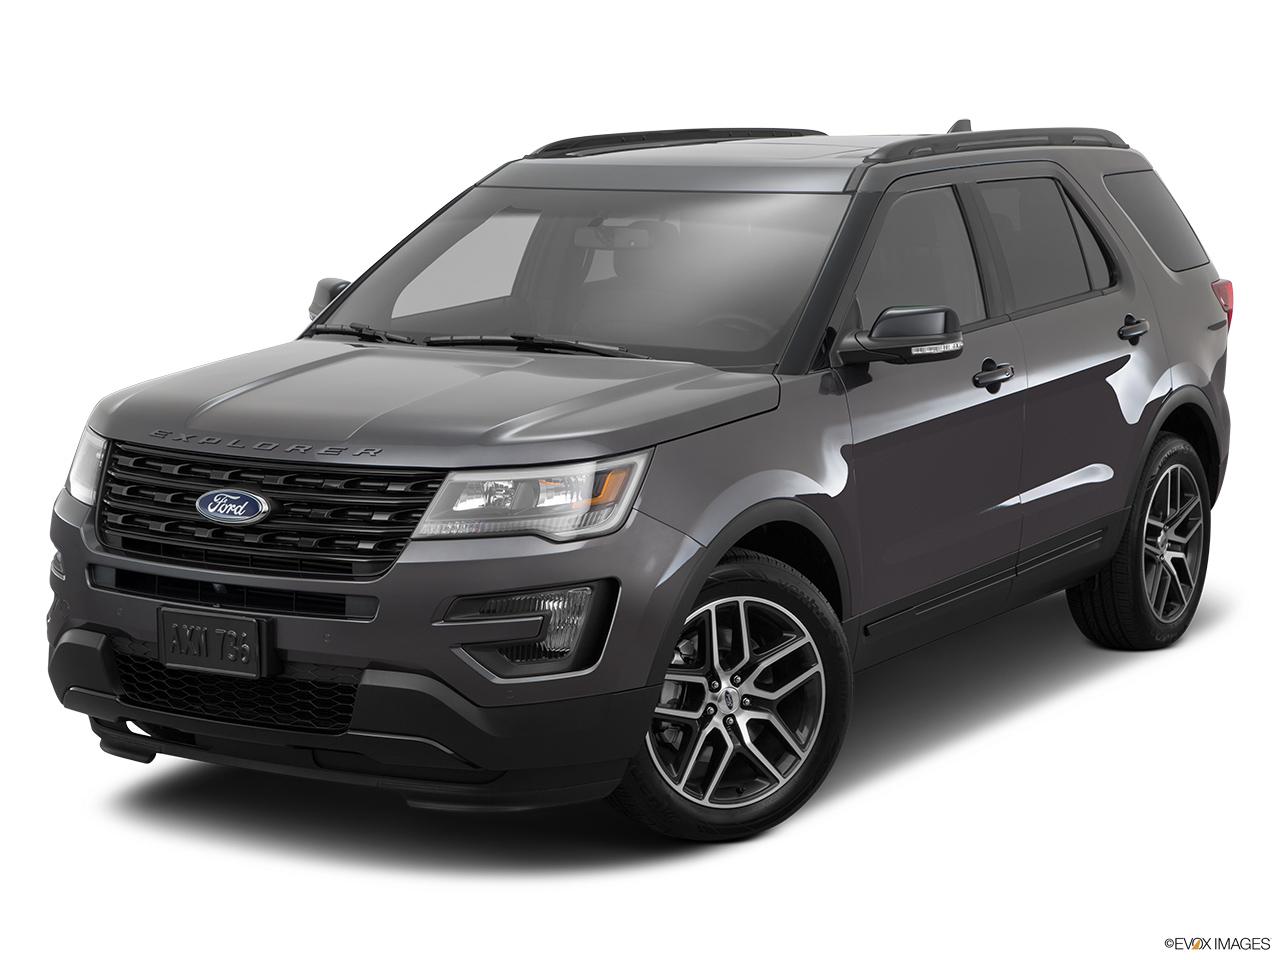 ford explorer 2018 3 5l v6 sport ecoboost in kuwait new car prices specs reviews photos. Black Bedroom Furniture Sets. Home Design Ideas